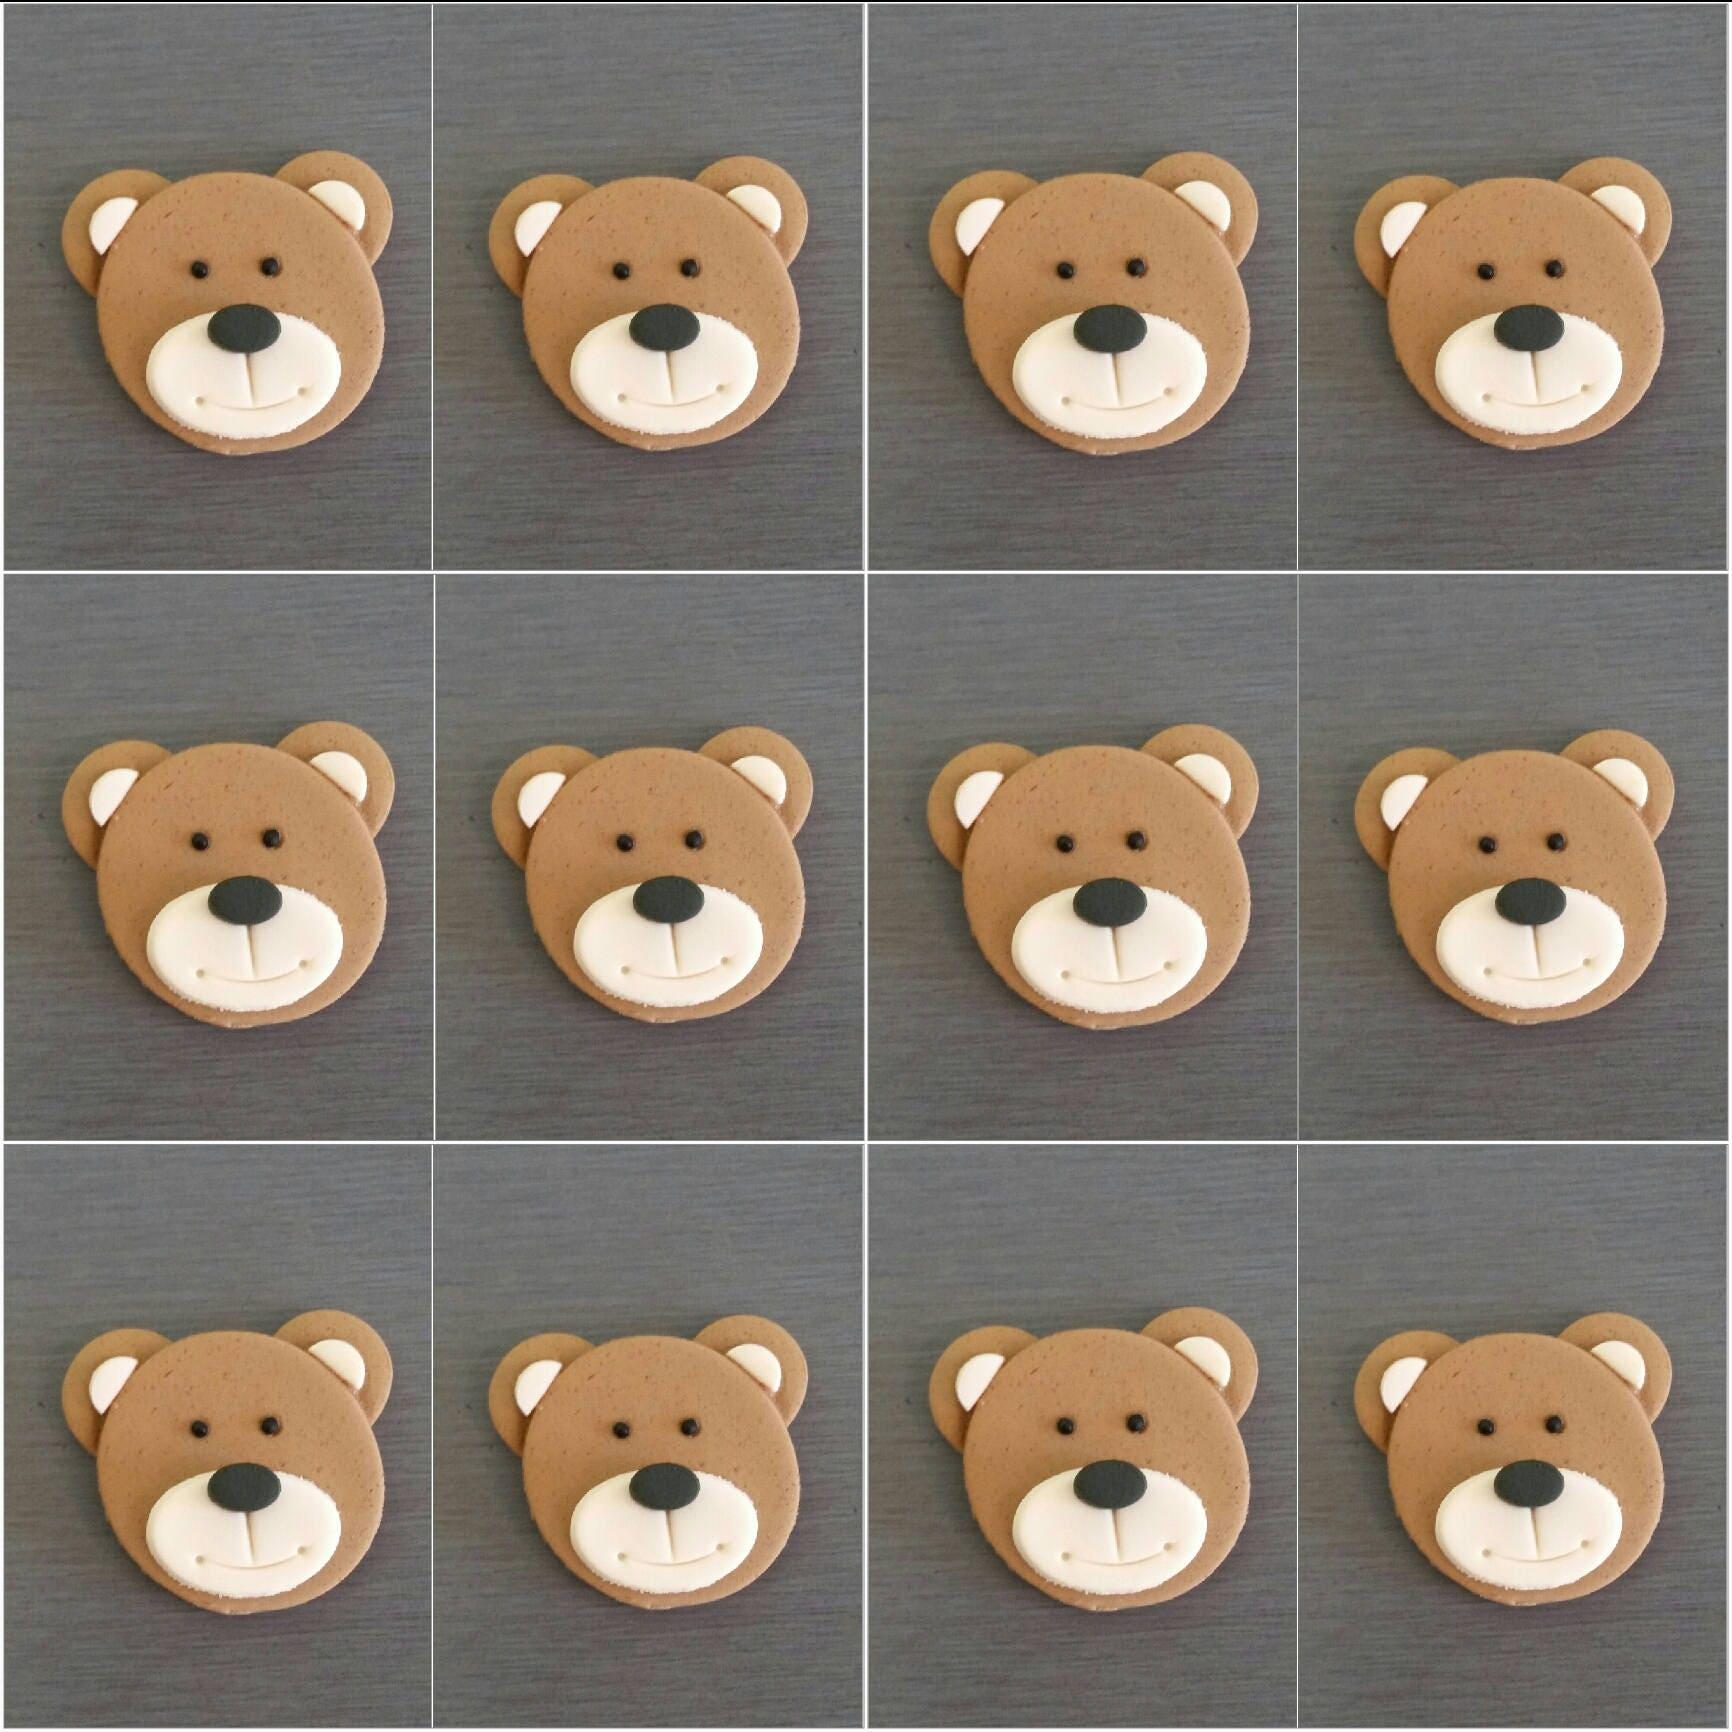 12 X Teddy Bear Cupcake Toppers Fondant Teddy S Teddy Etsy